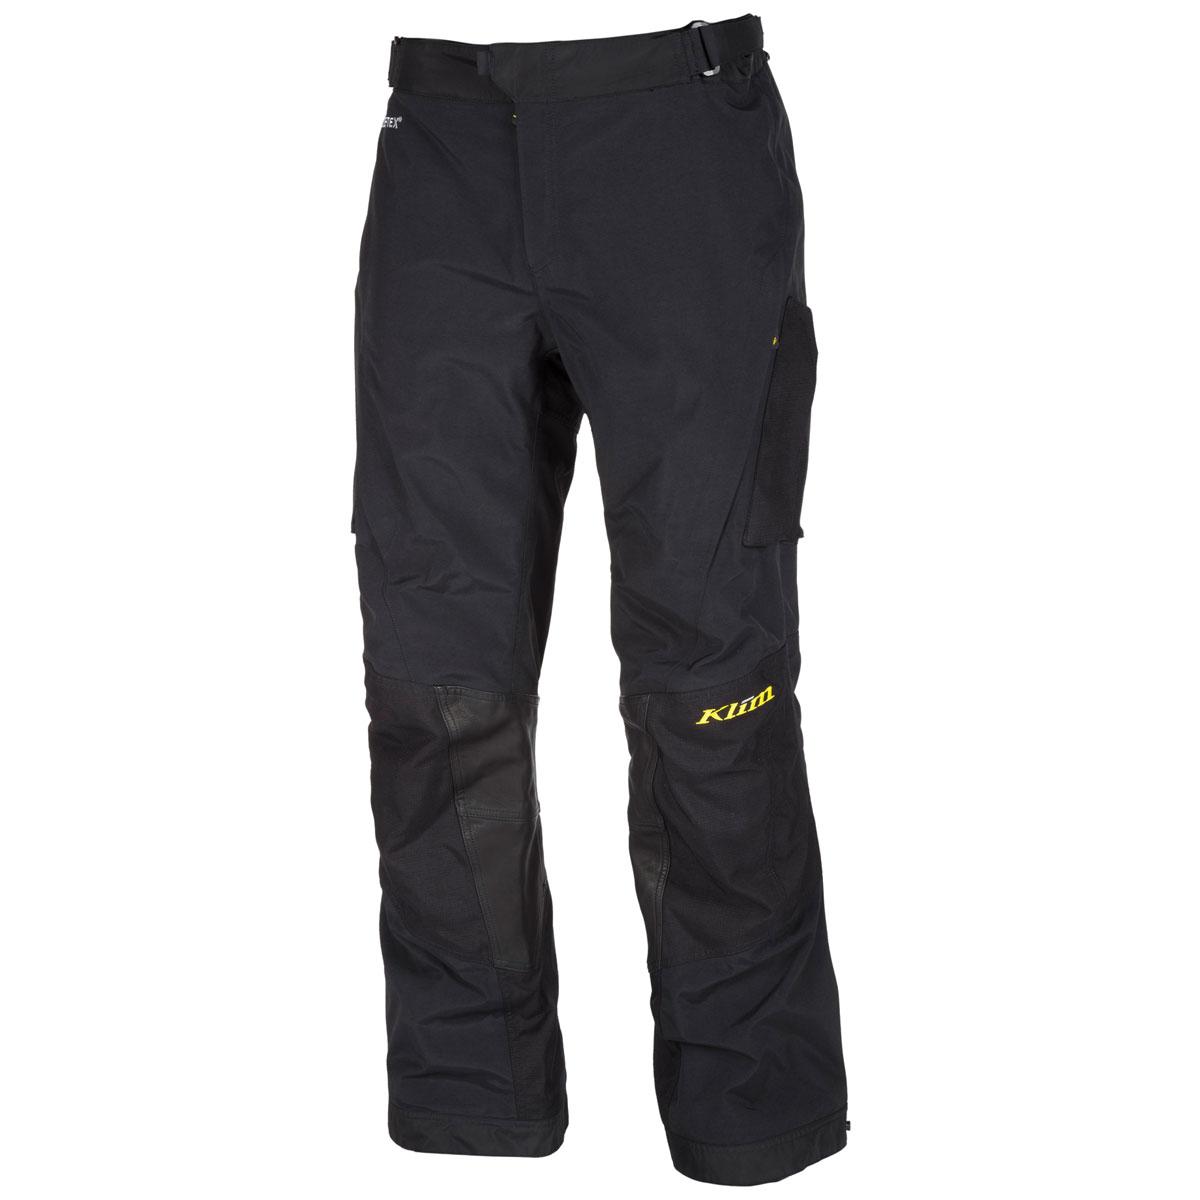 Klim Carlsbad Black Riding Pants